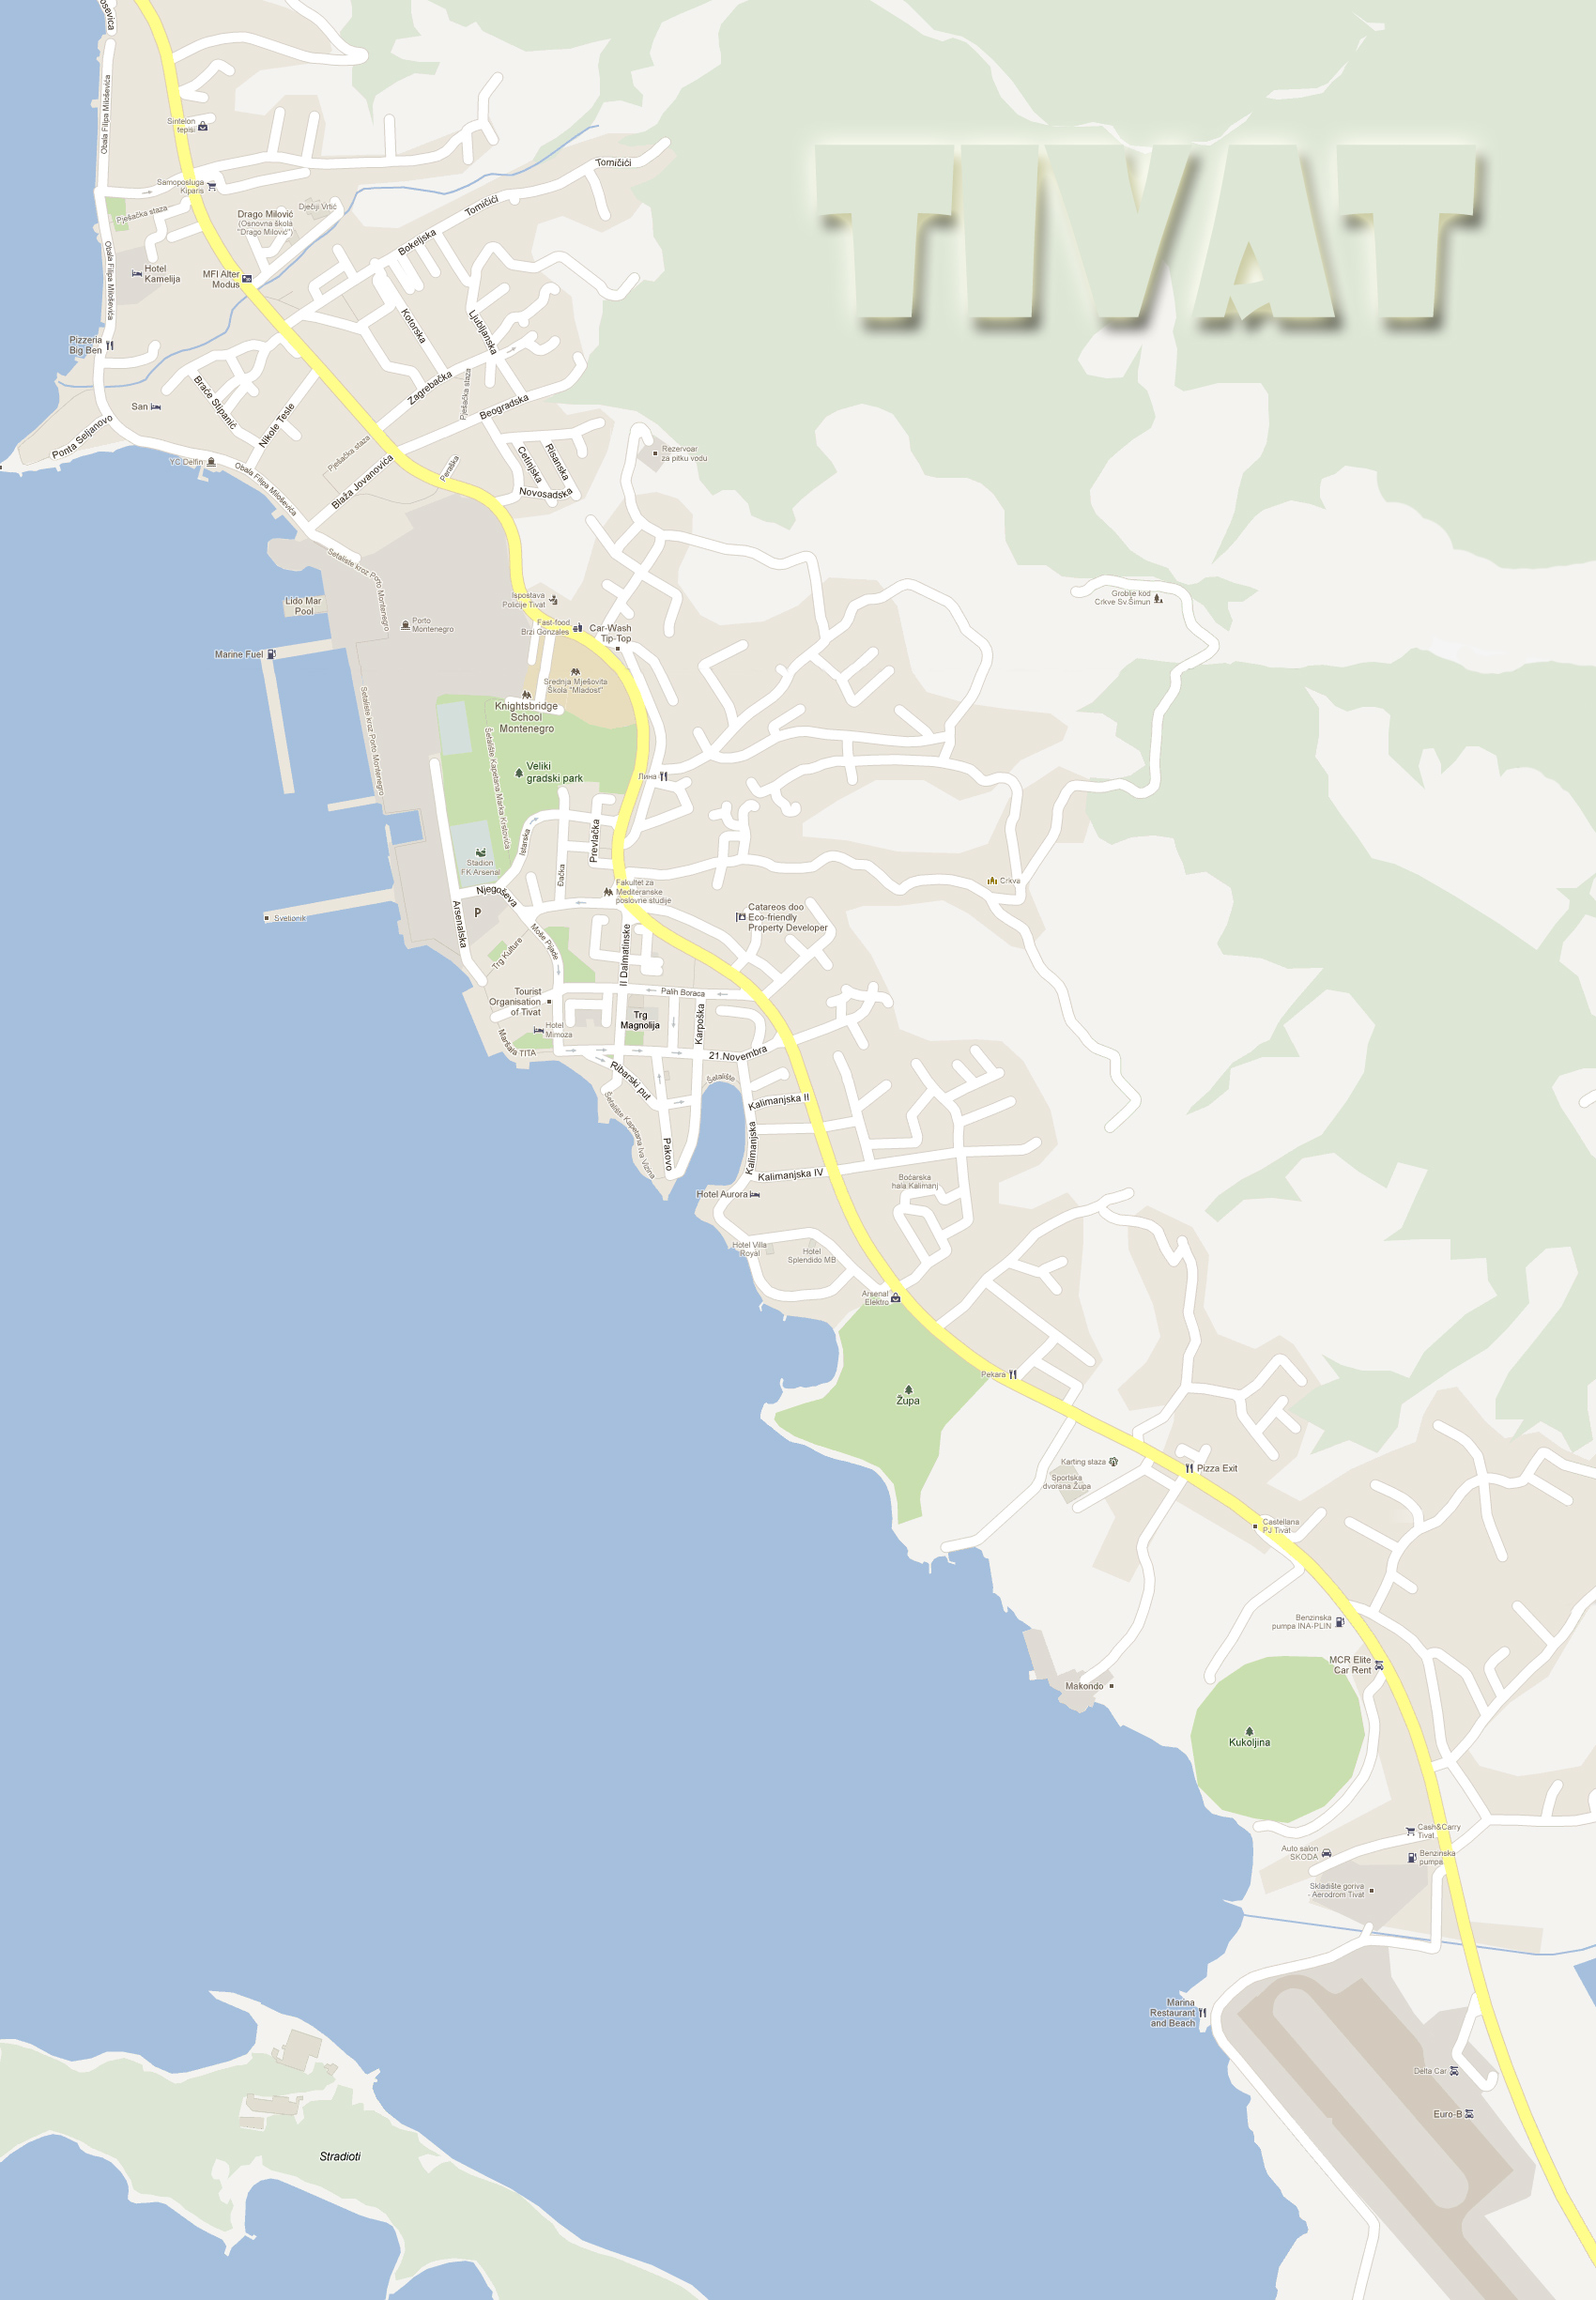 mapa crne gore tivat Mapa   Tivat, Crna Gora mapa crne gore tivat